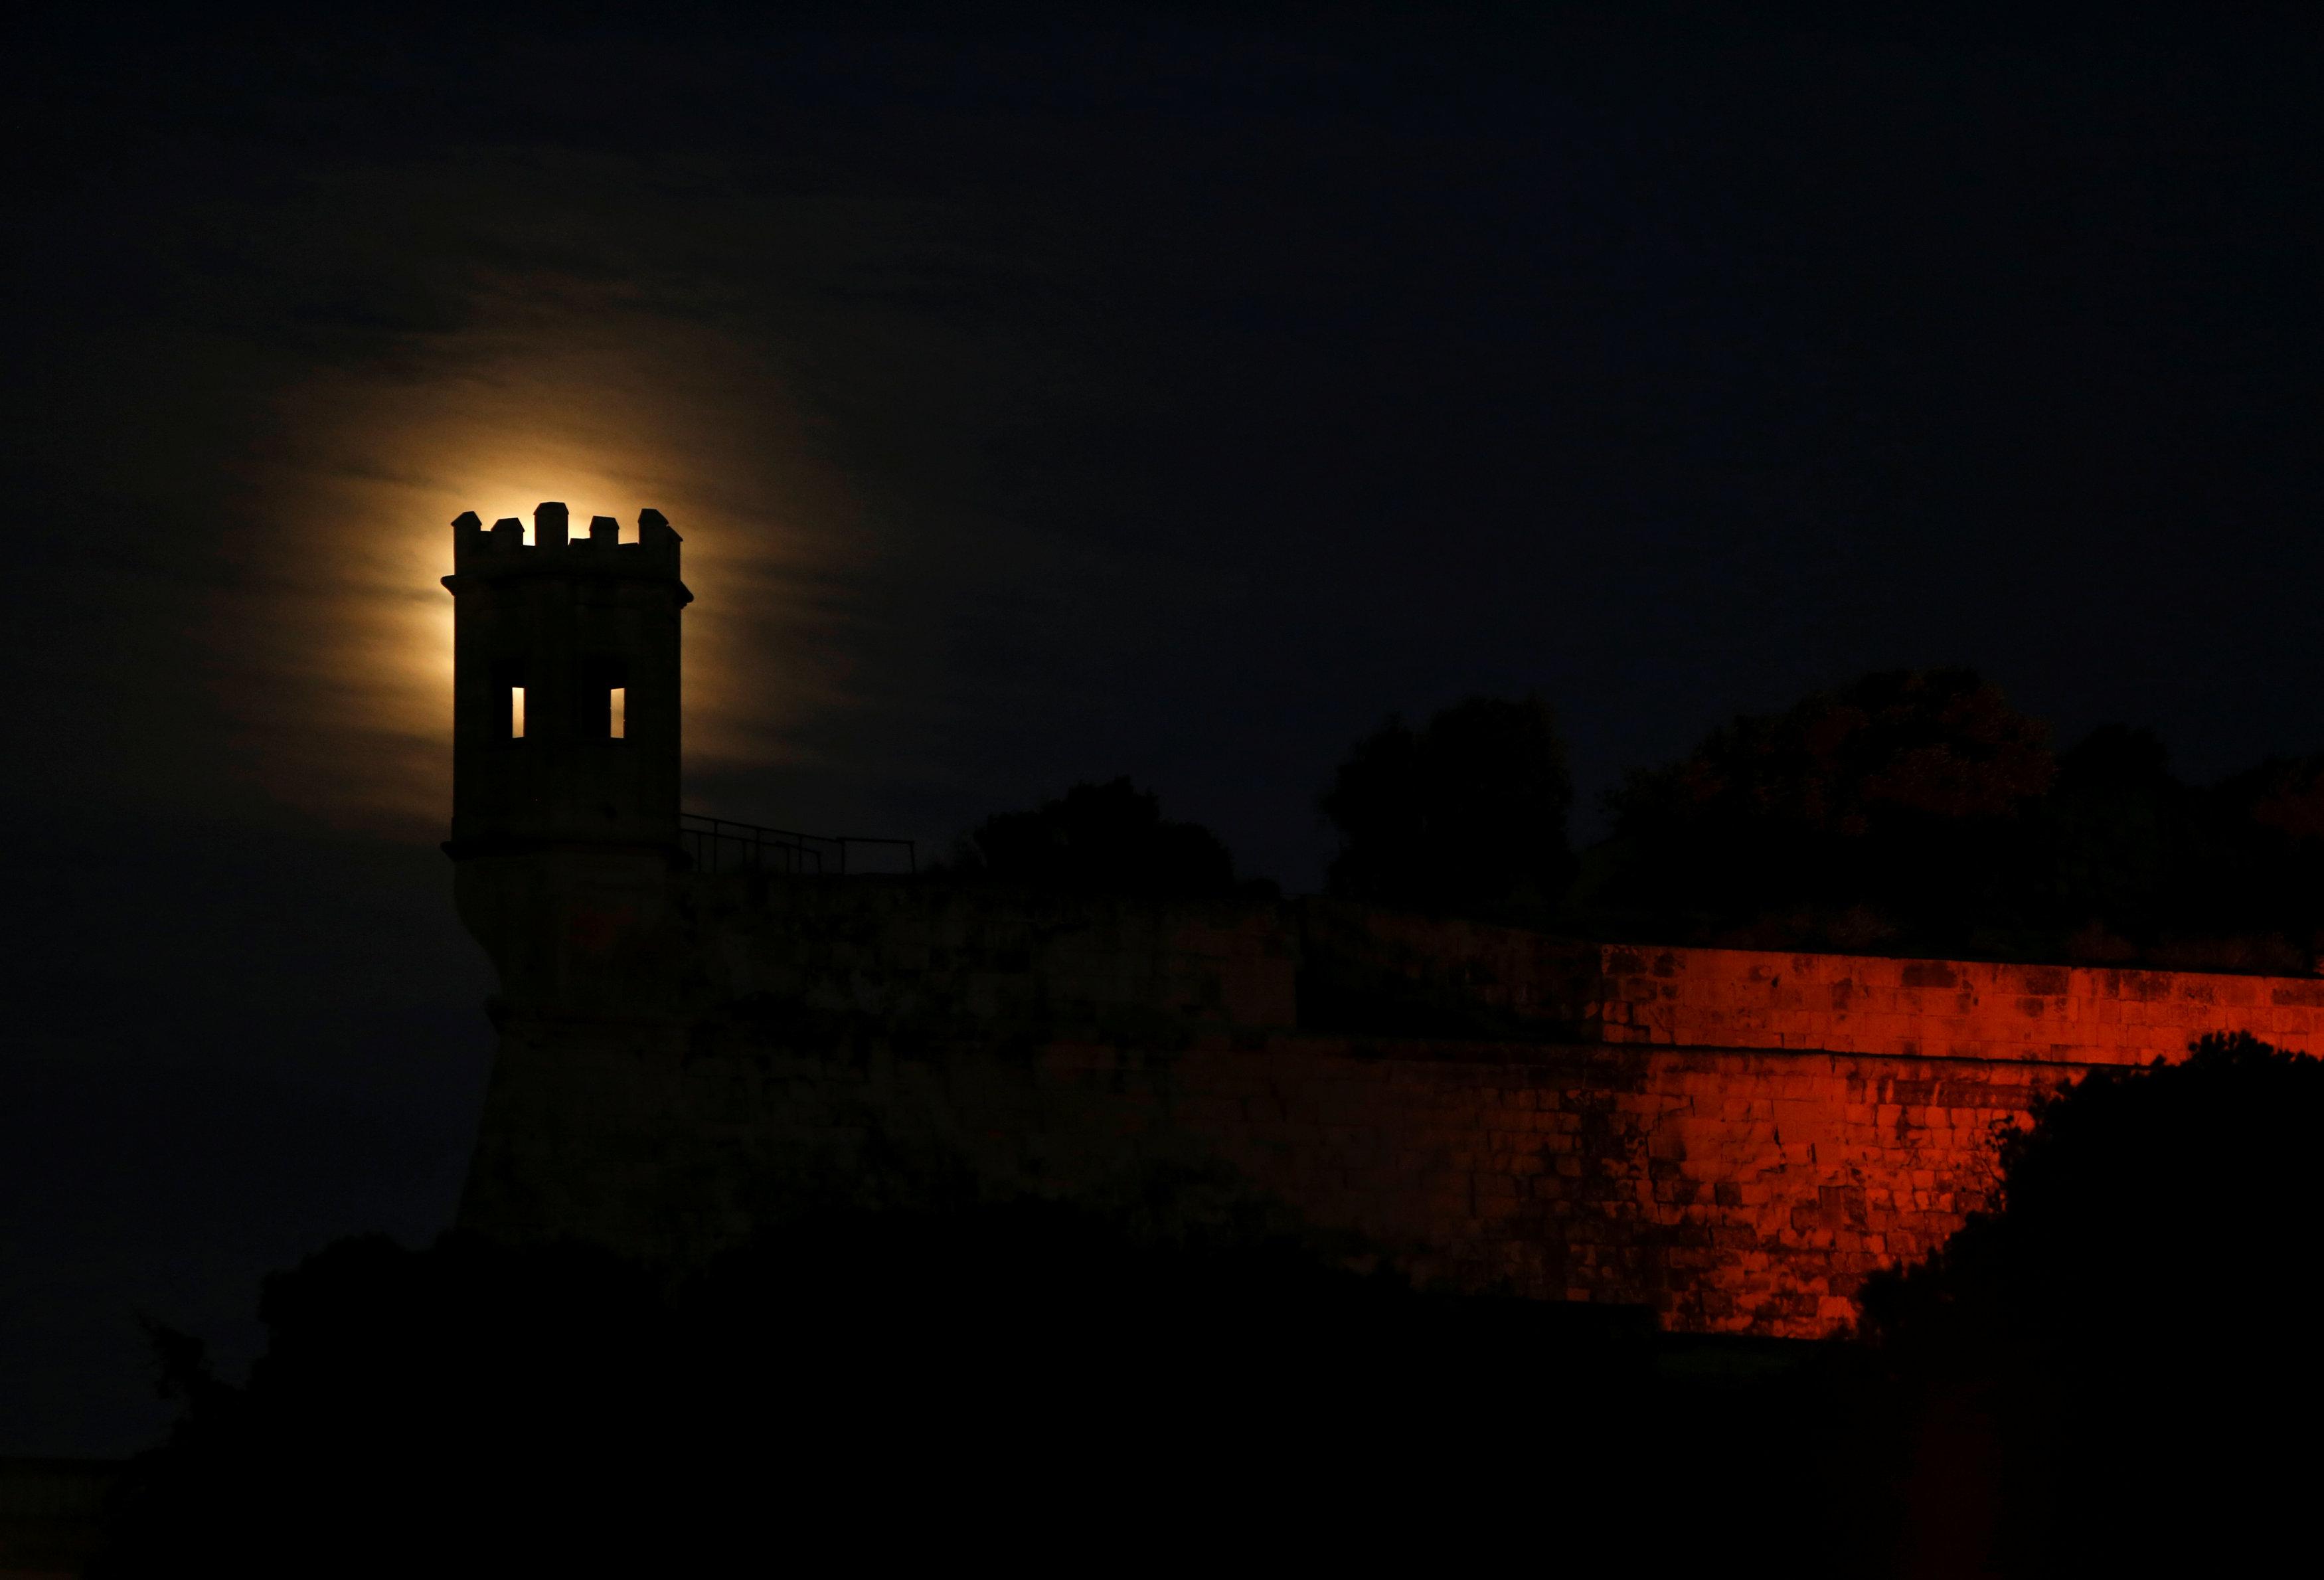 La superluna sobre el bastión San Salvatore en Pieta, Malta, (REUTERS/Darrin Zammit Lupi)